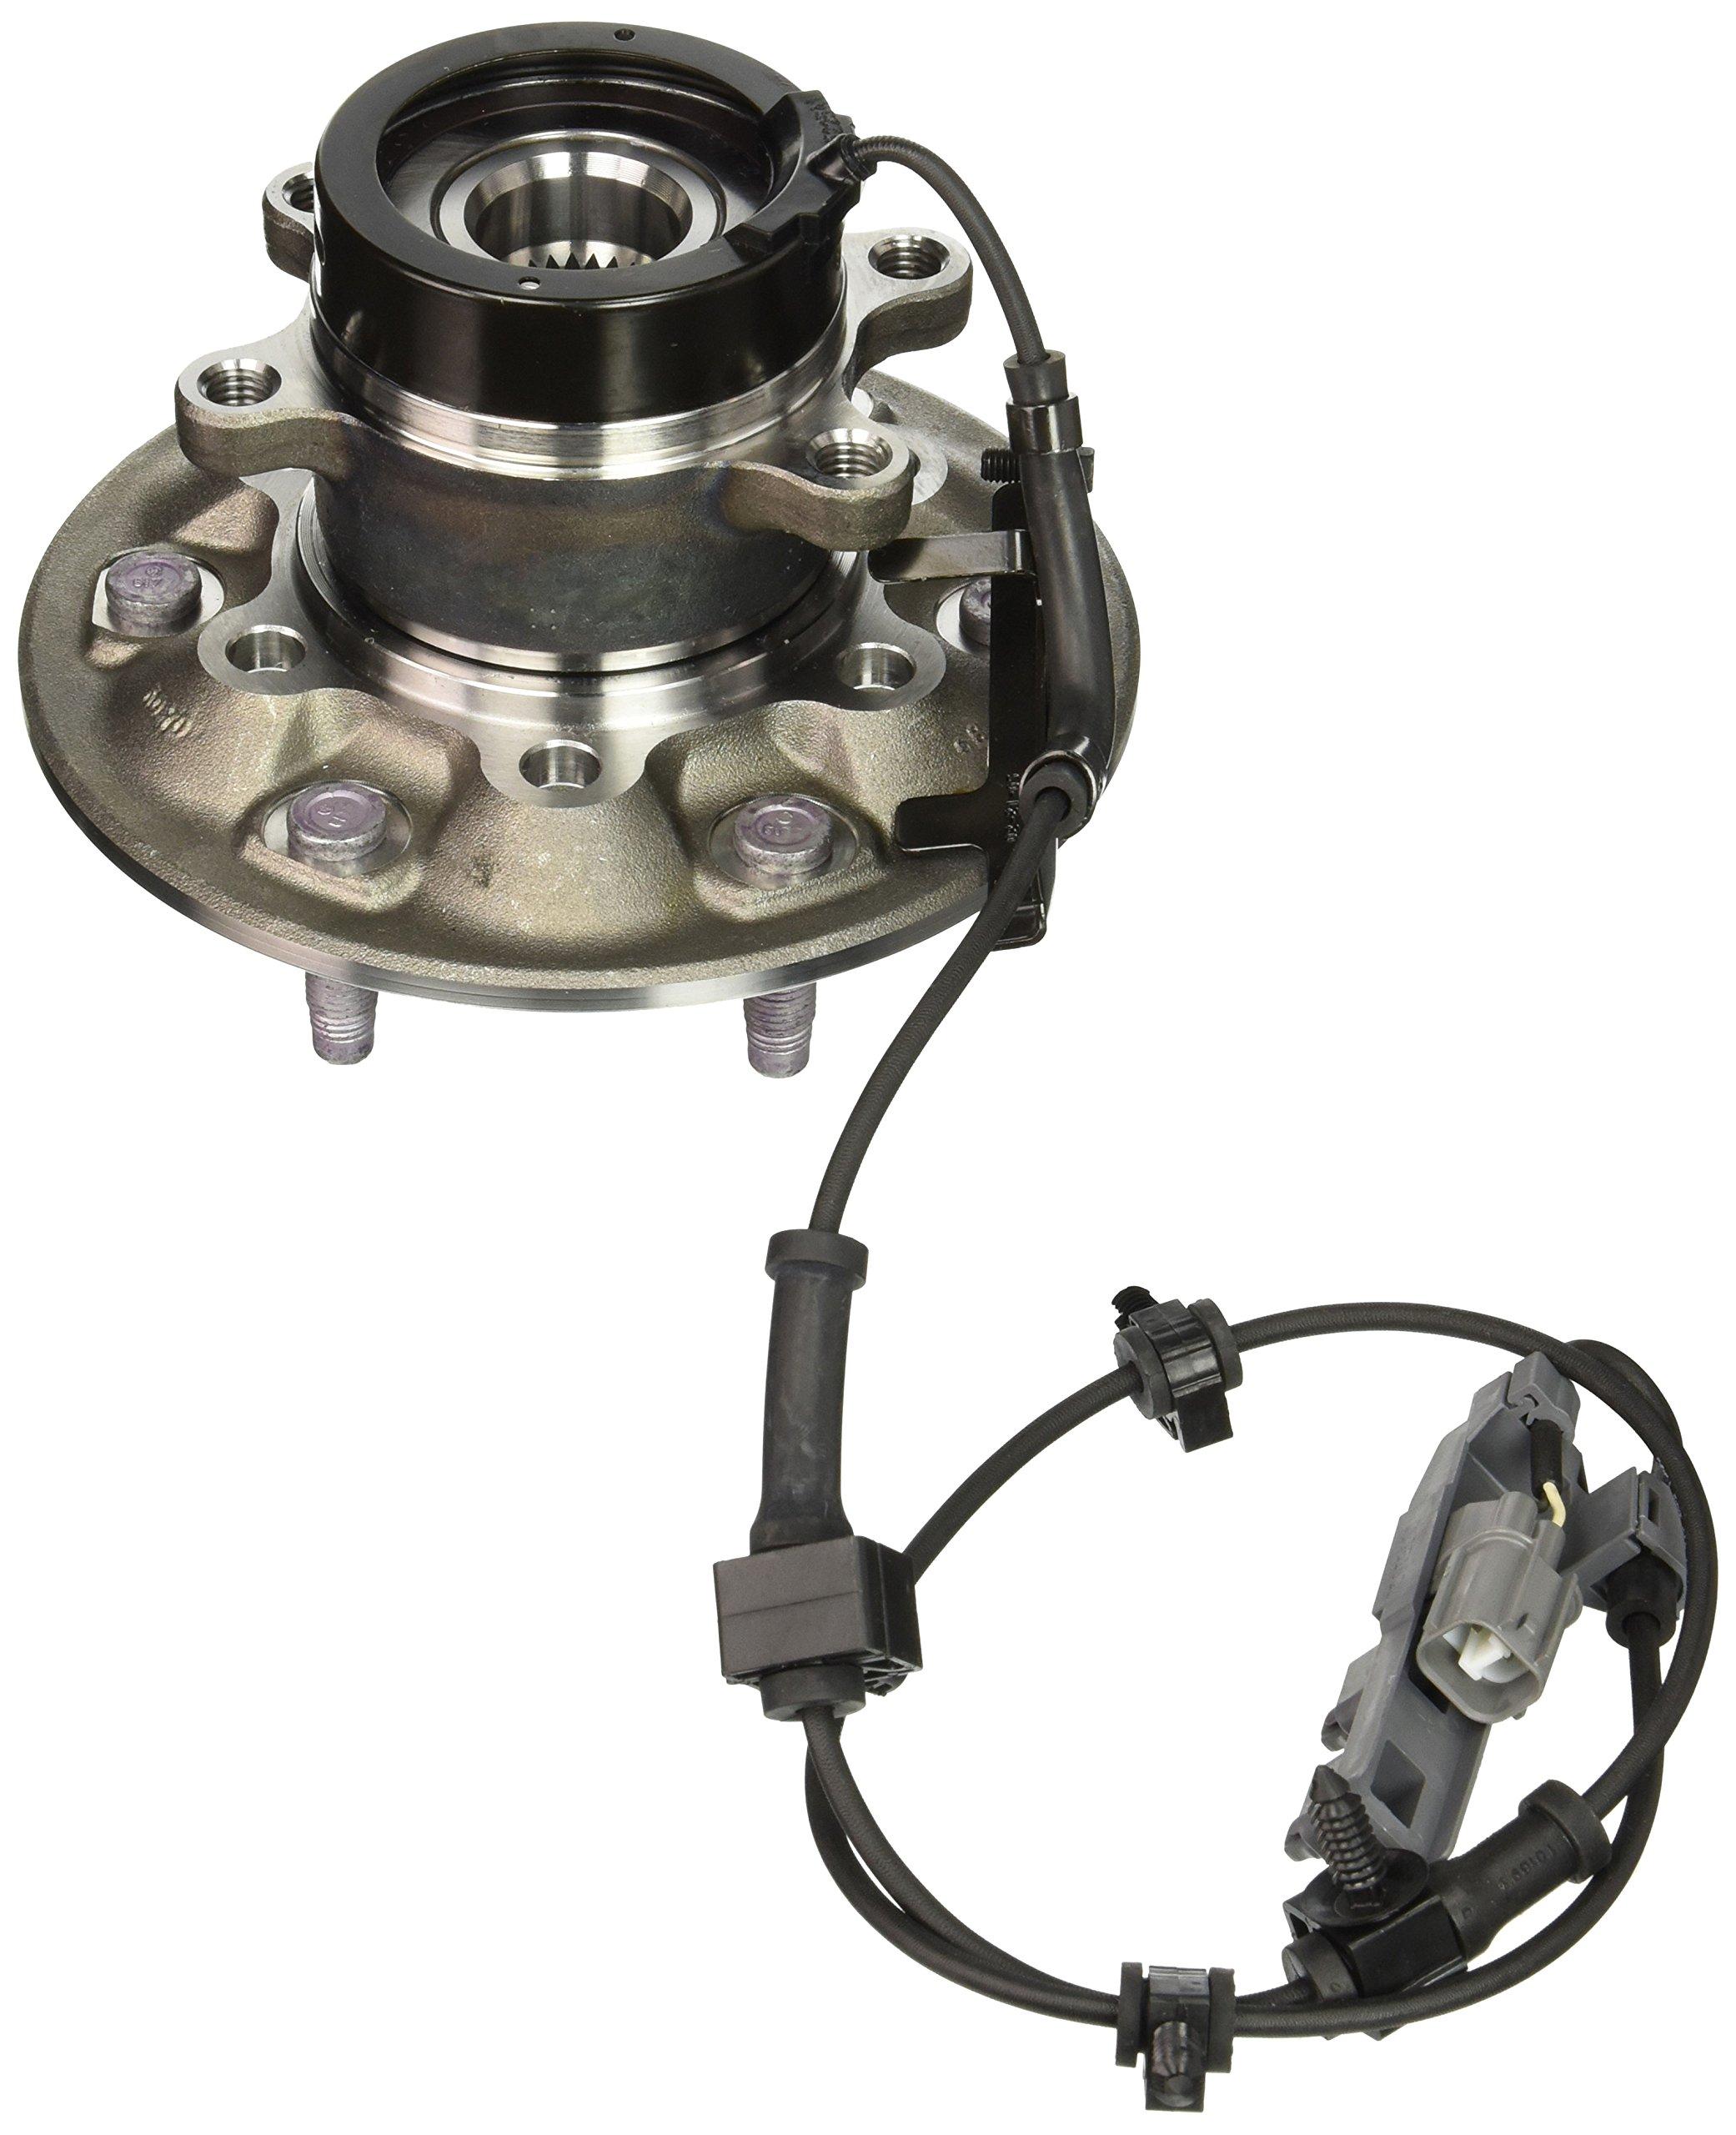 Timken HA590023 Axle Bearing and Hub Assembly